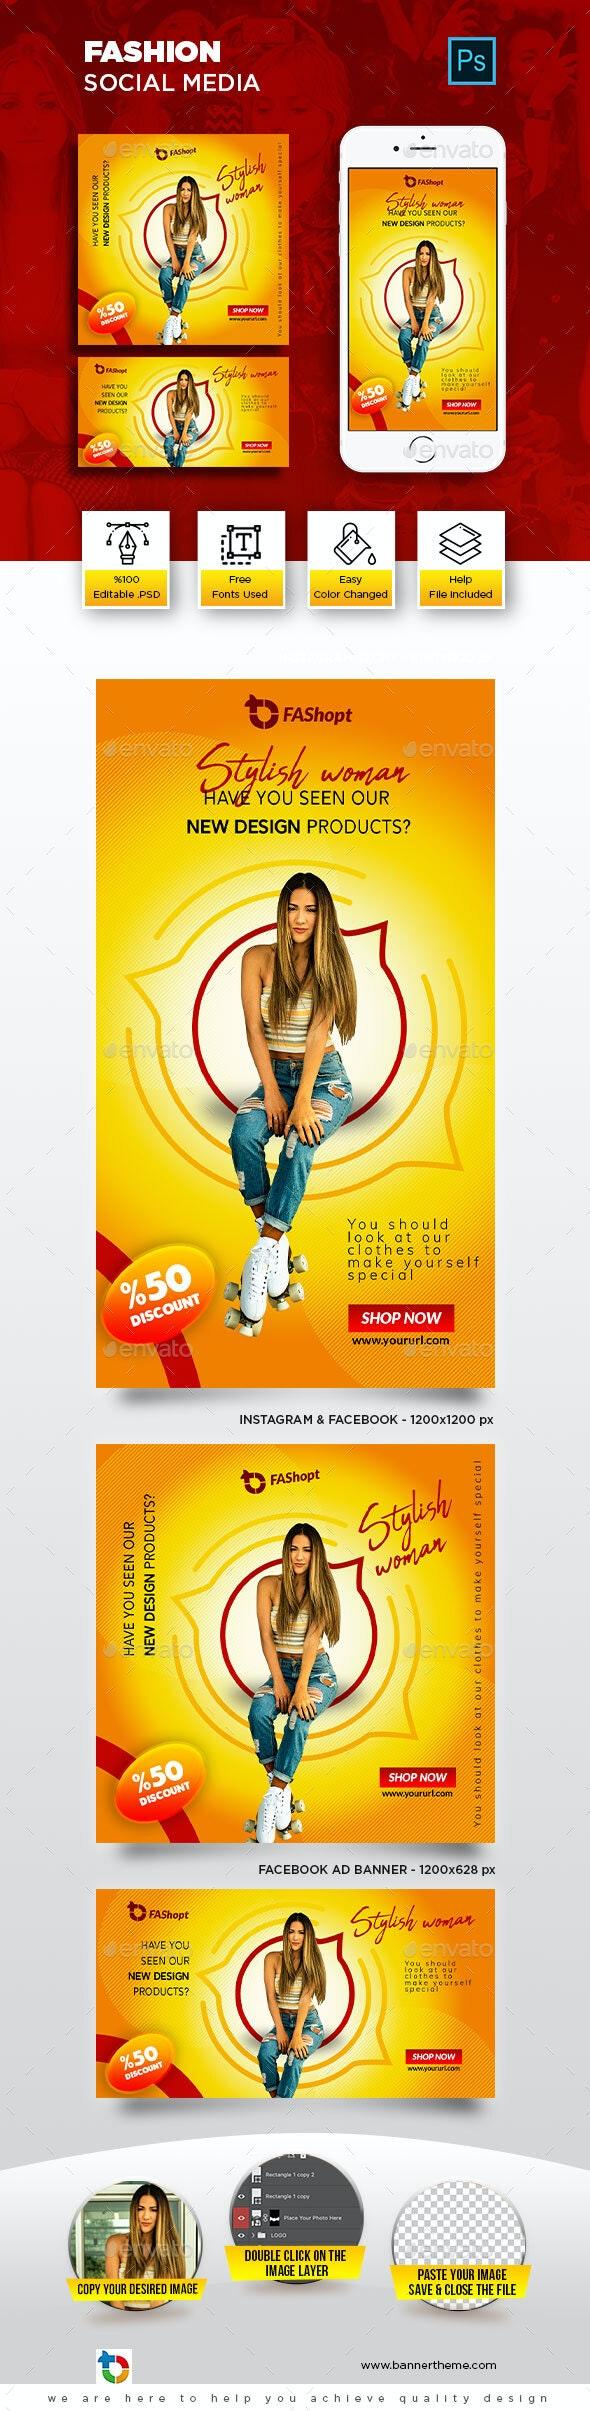 Fashion Social Media Banner - Social Media Web Elements